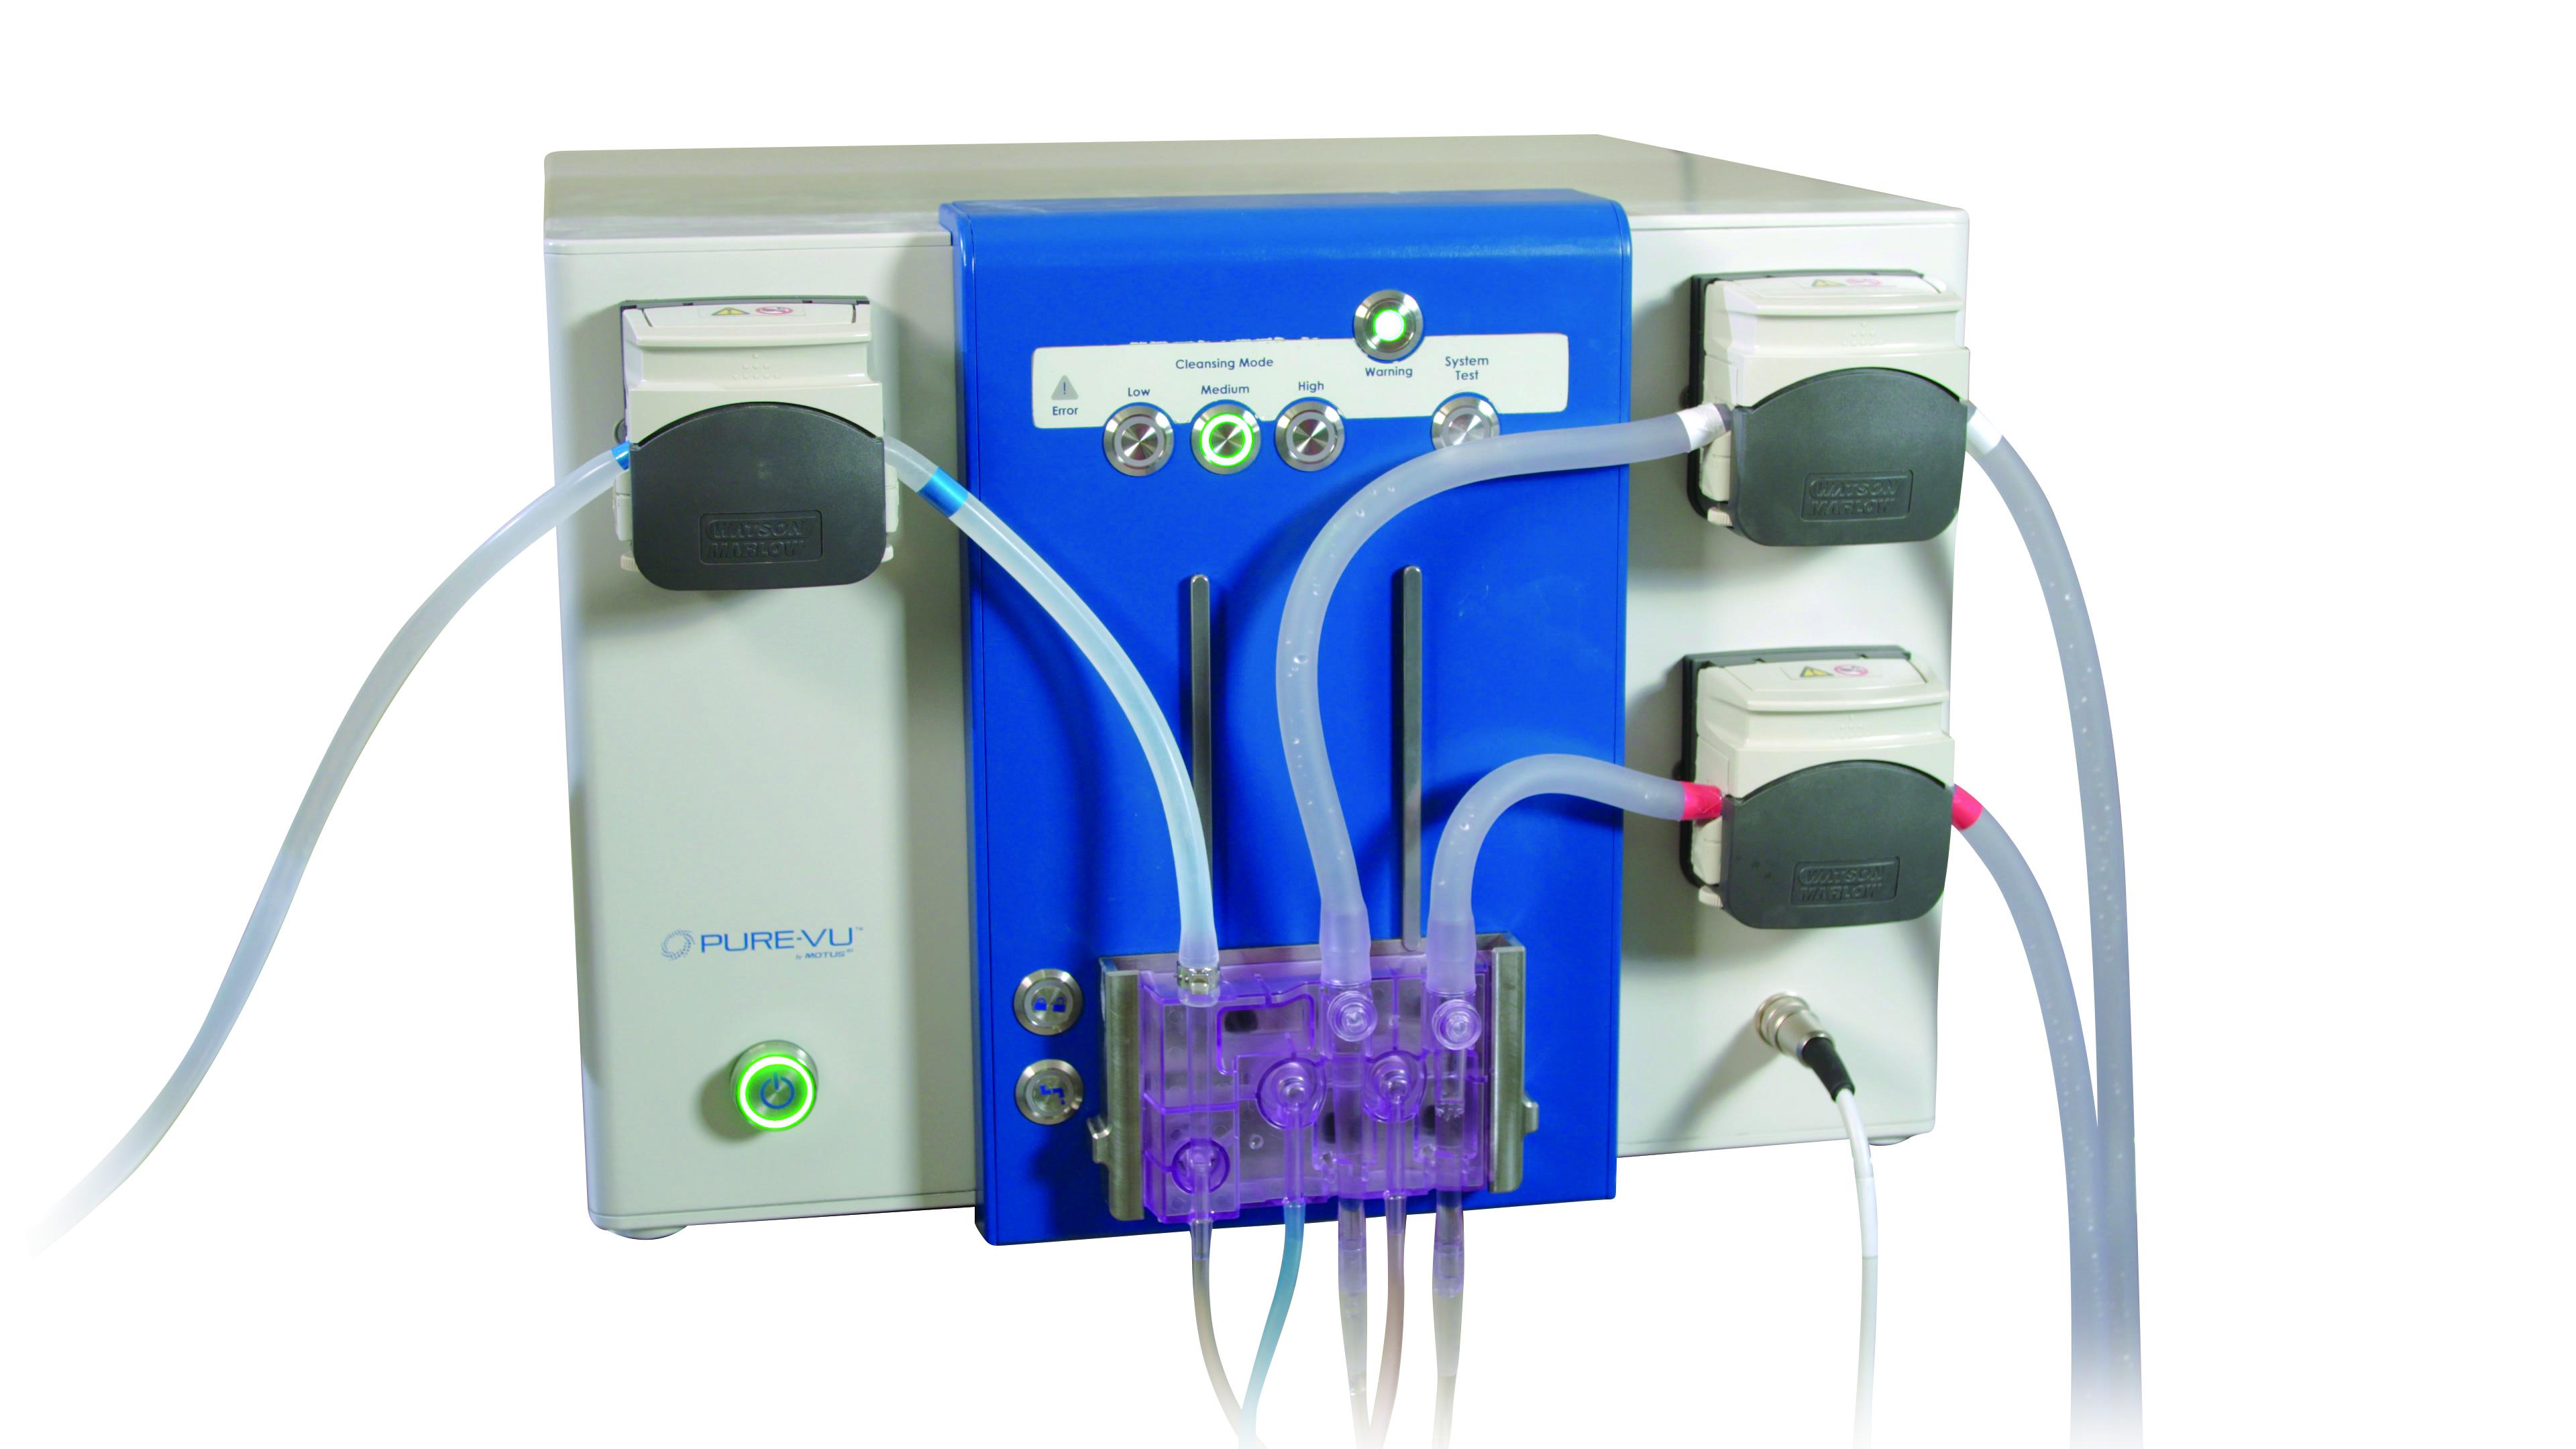 The Pure-Vu® Controller